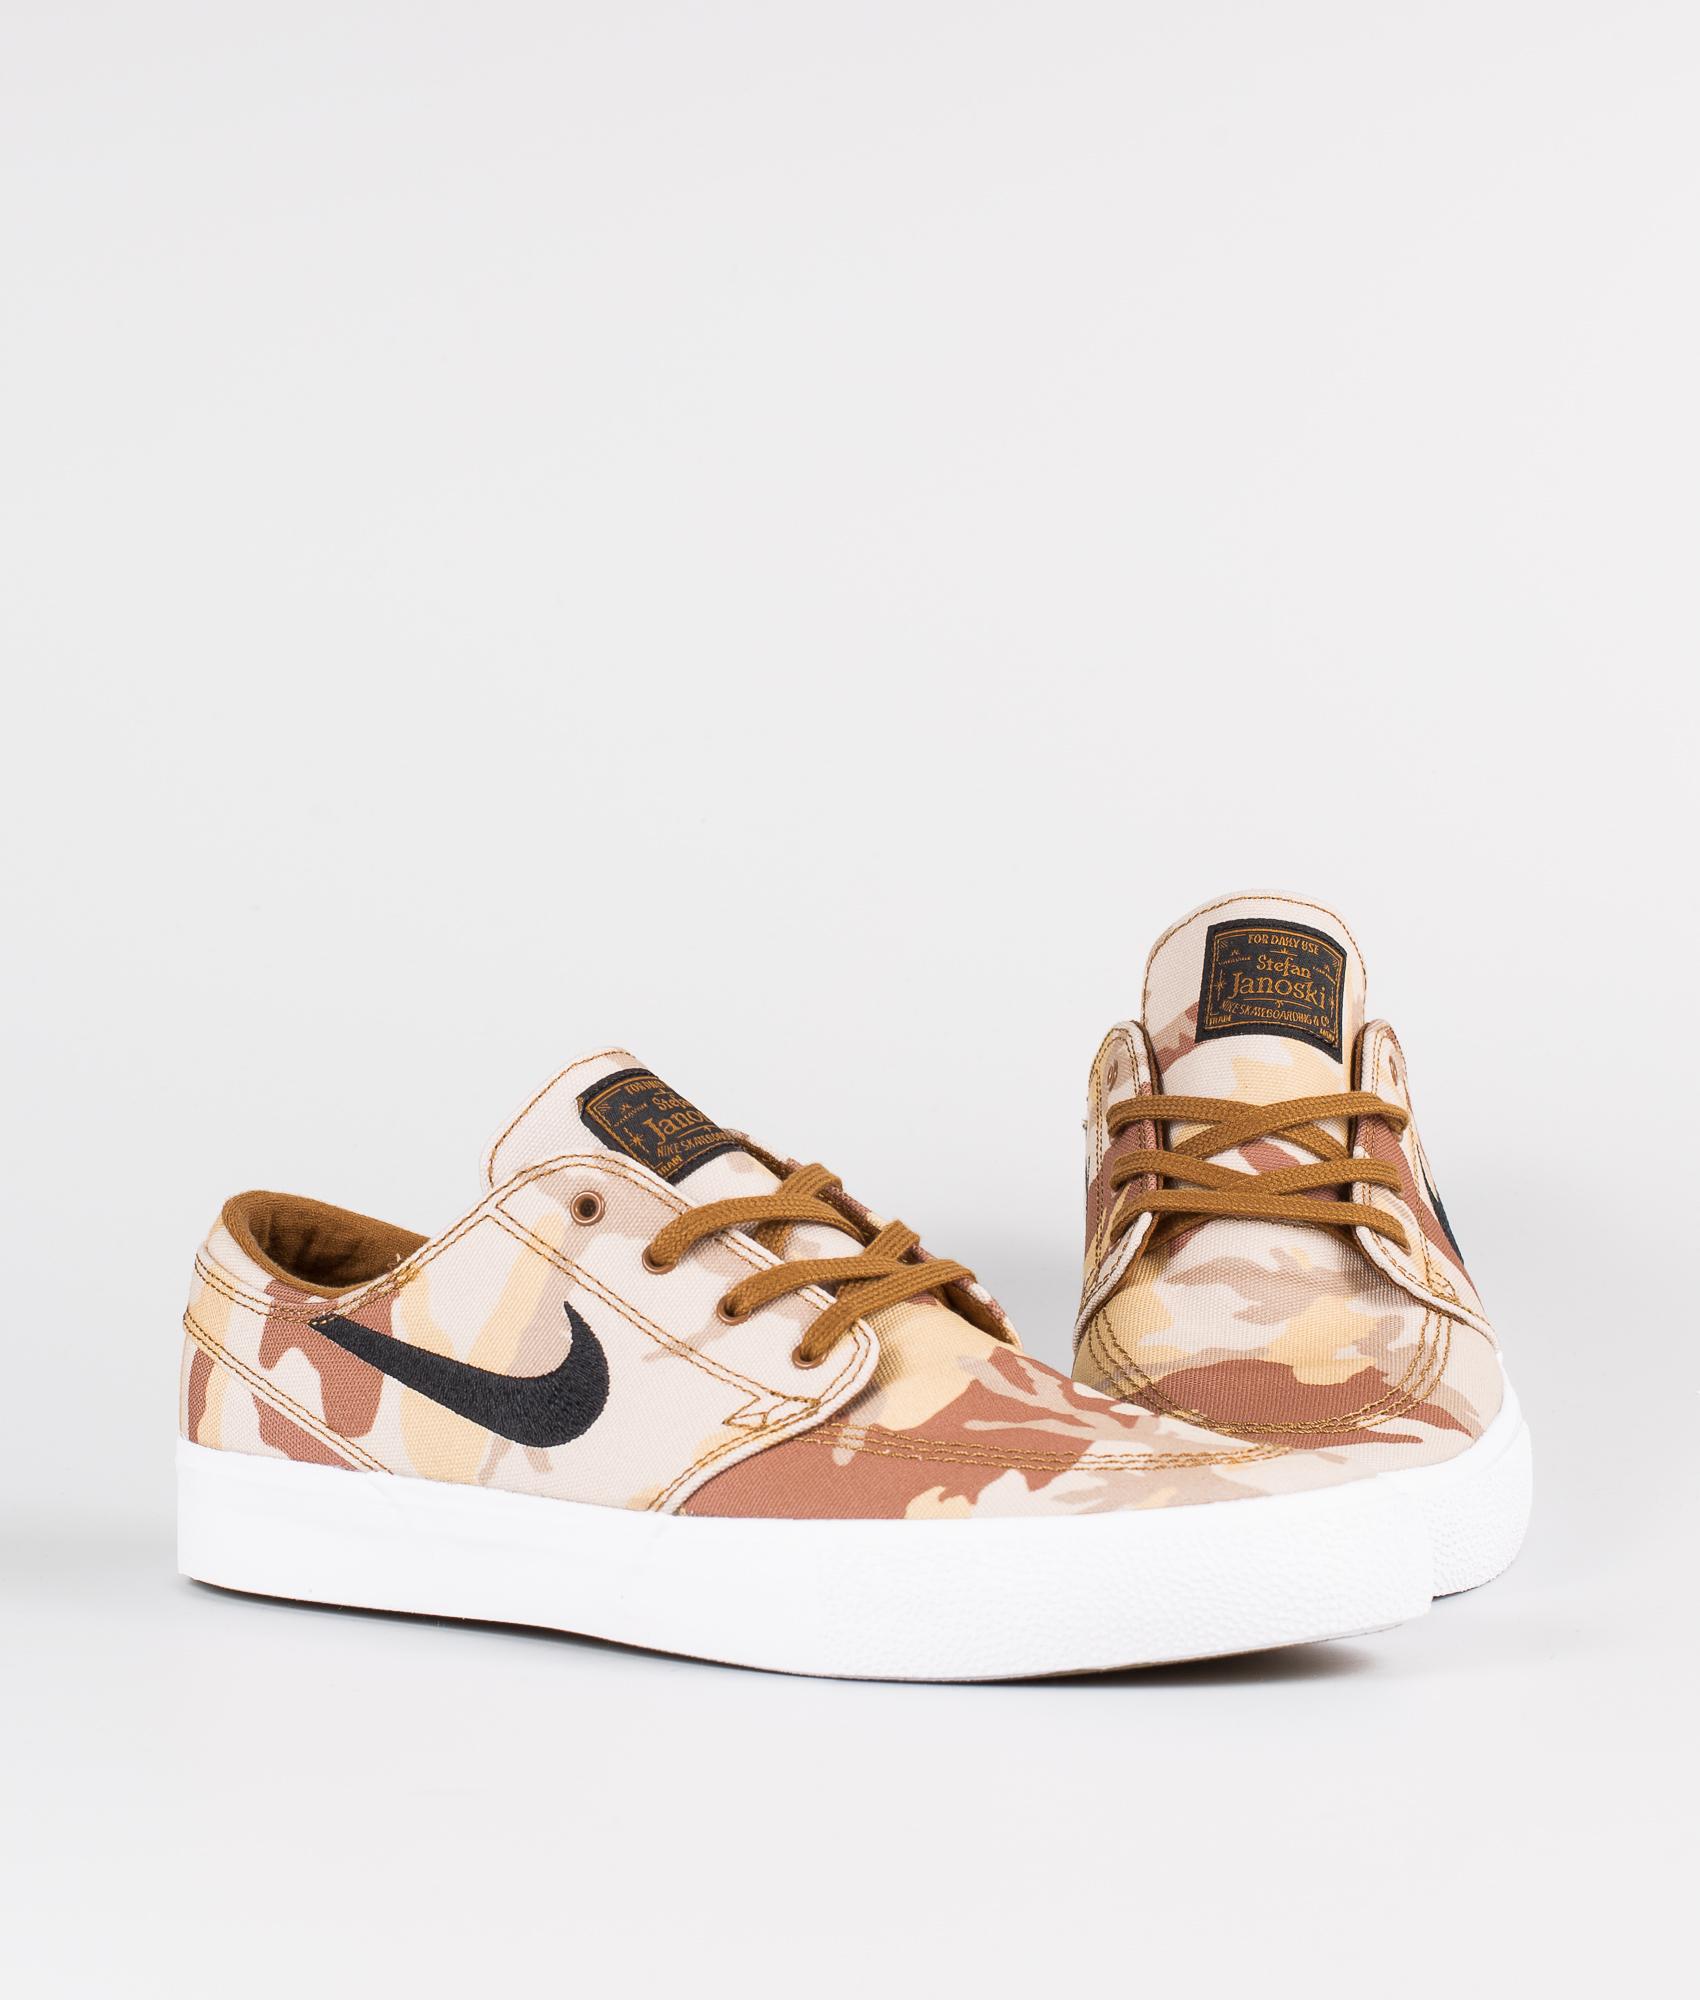 Brown Canvas Zoom Parachute Janoski Nike White BeigeBlack Ale Schuhe Rprm fYmy76Ibvg